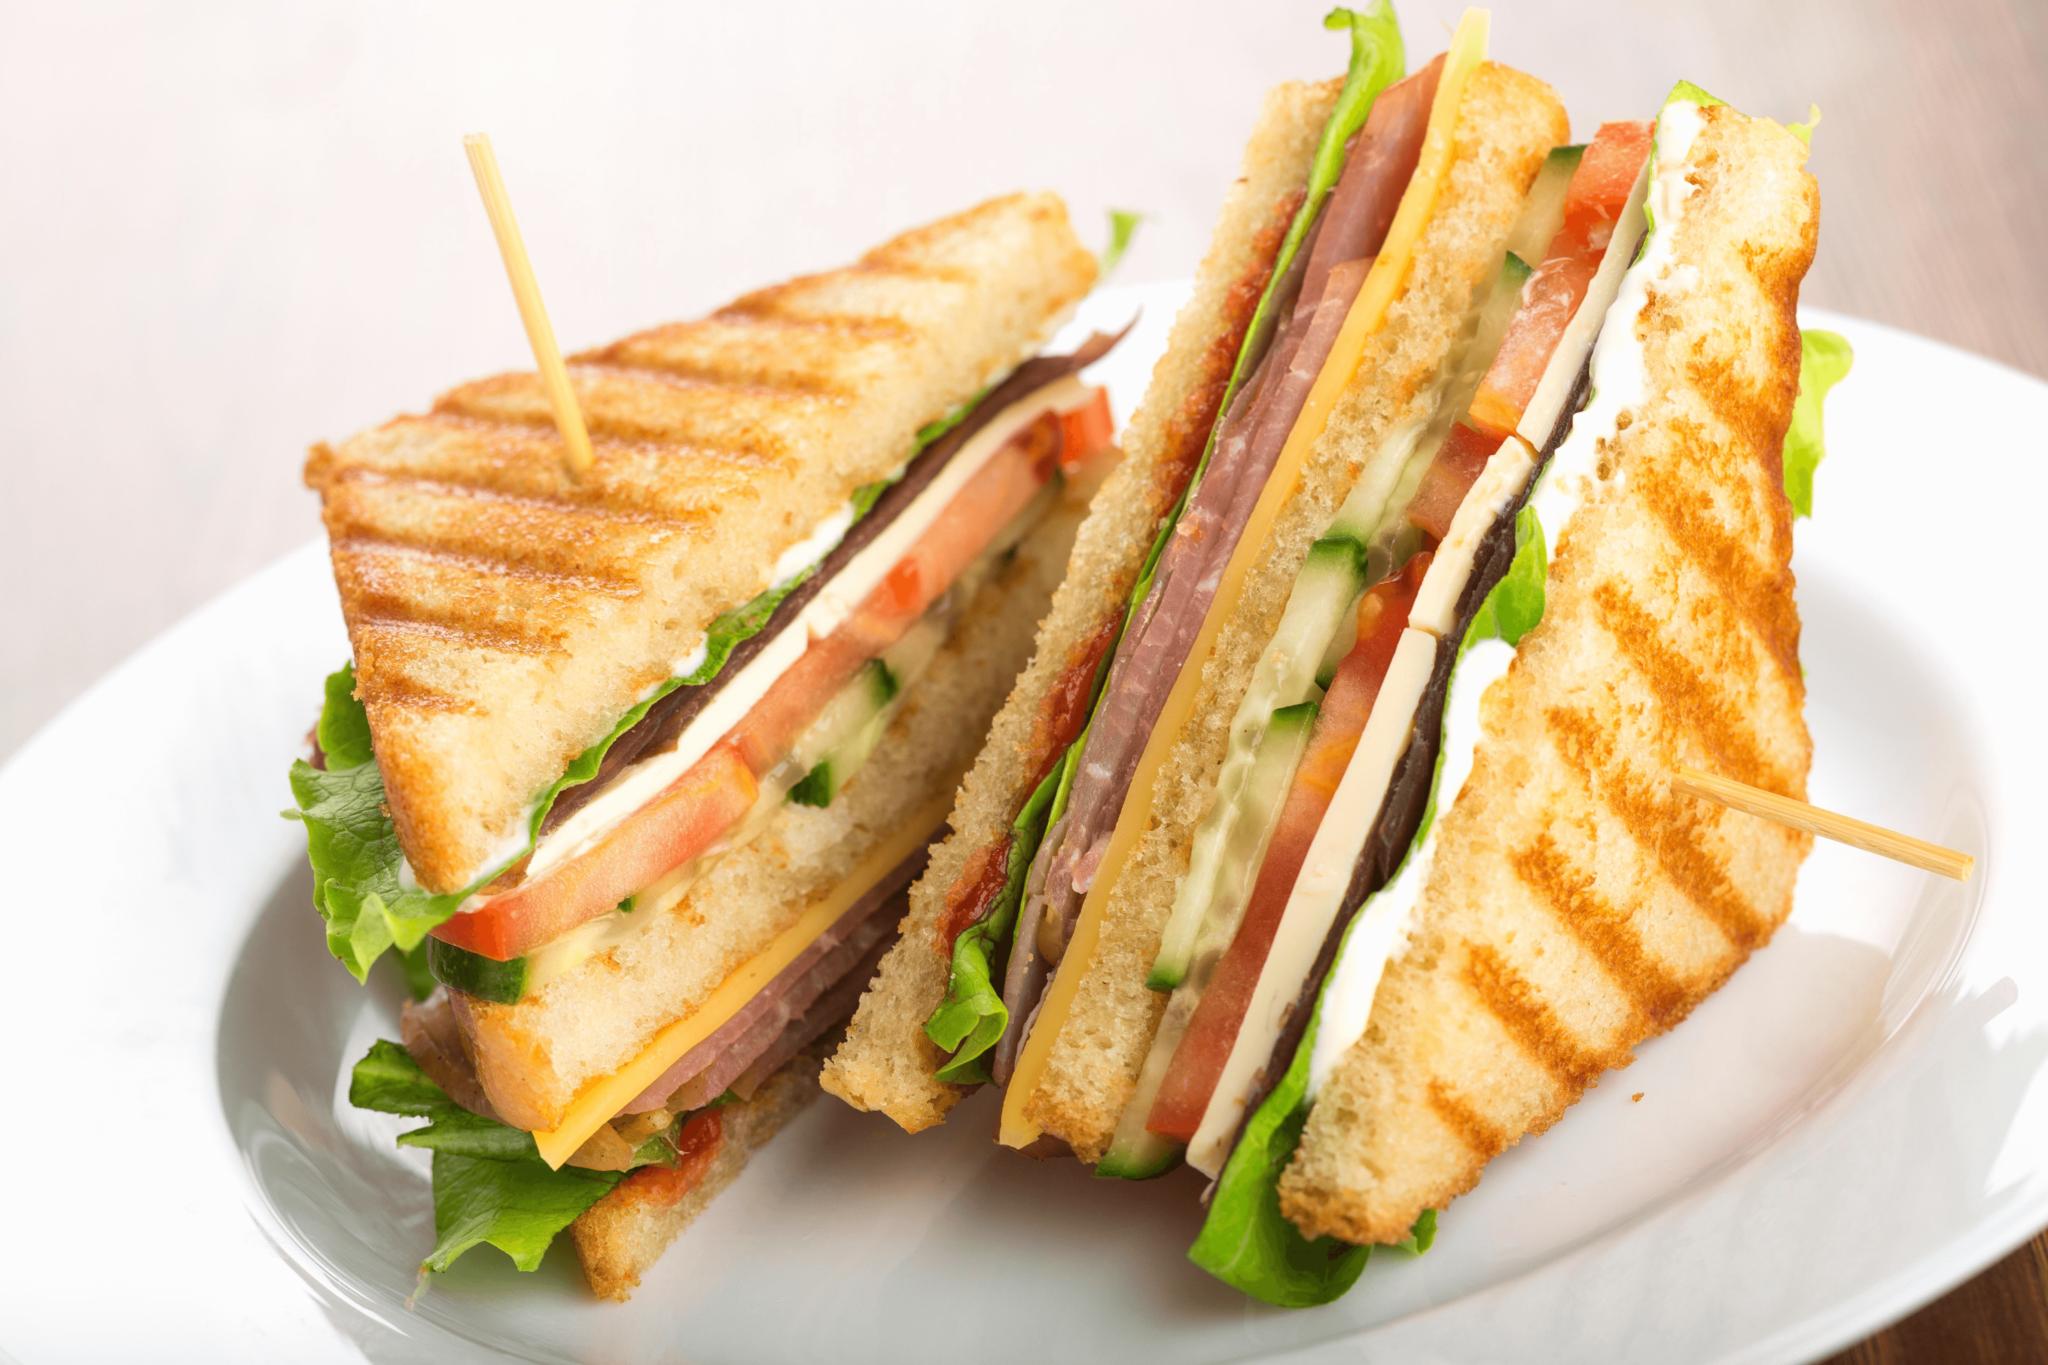 A Sandwich Masterclass with a Pro